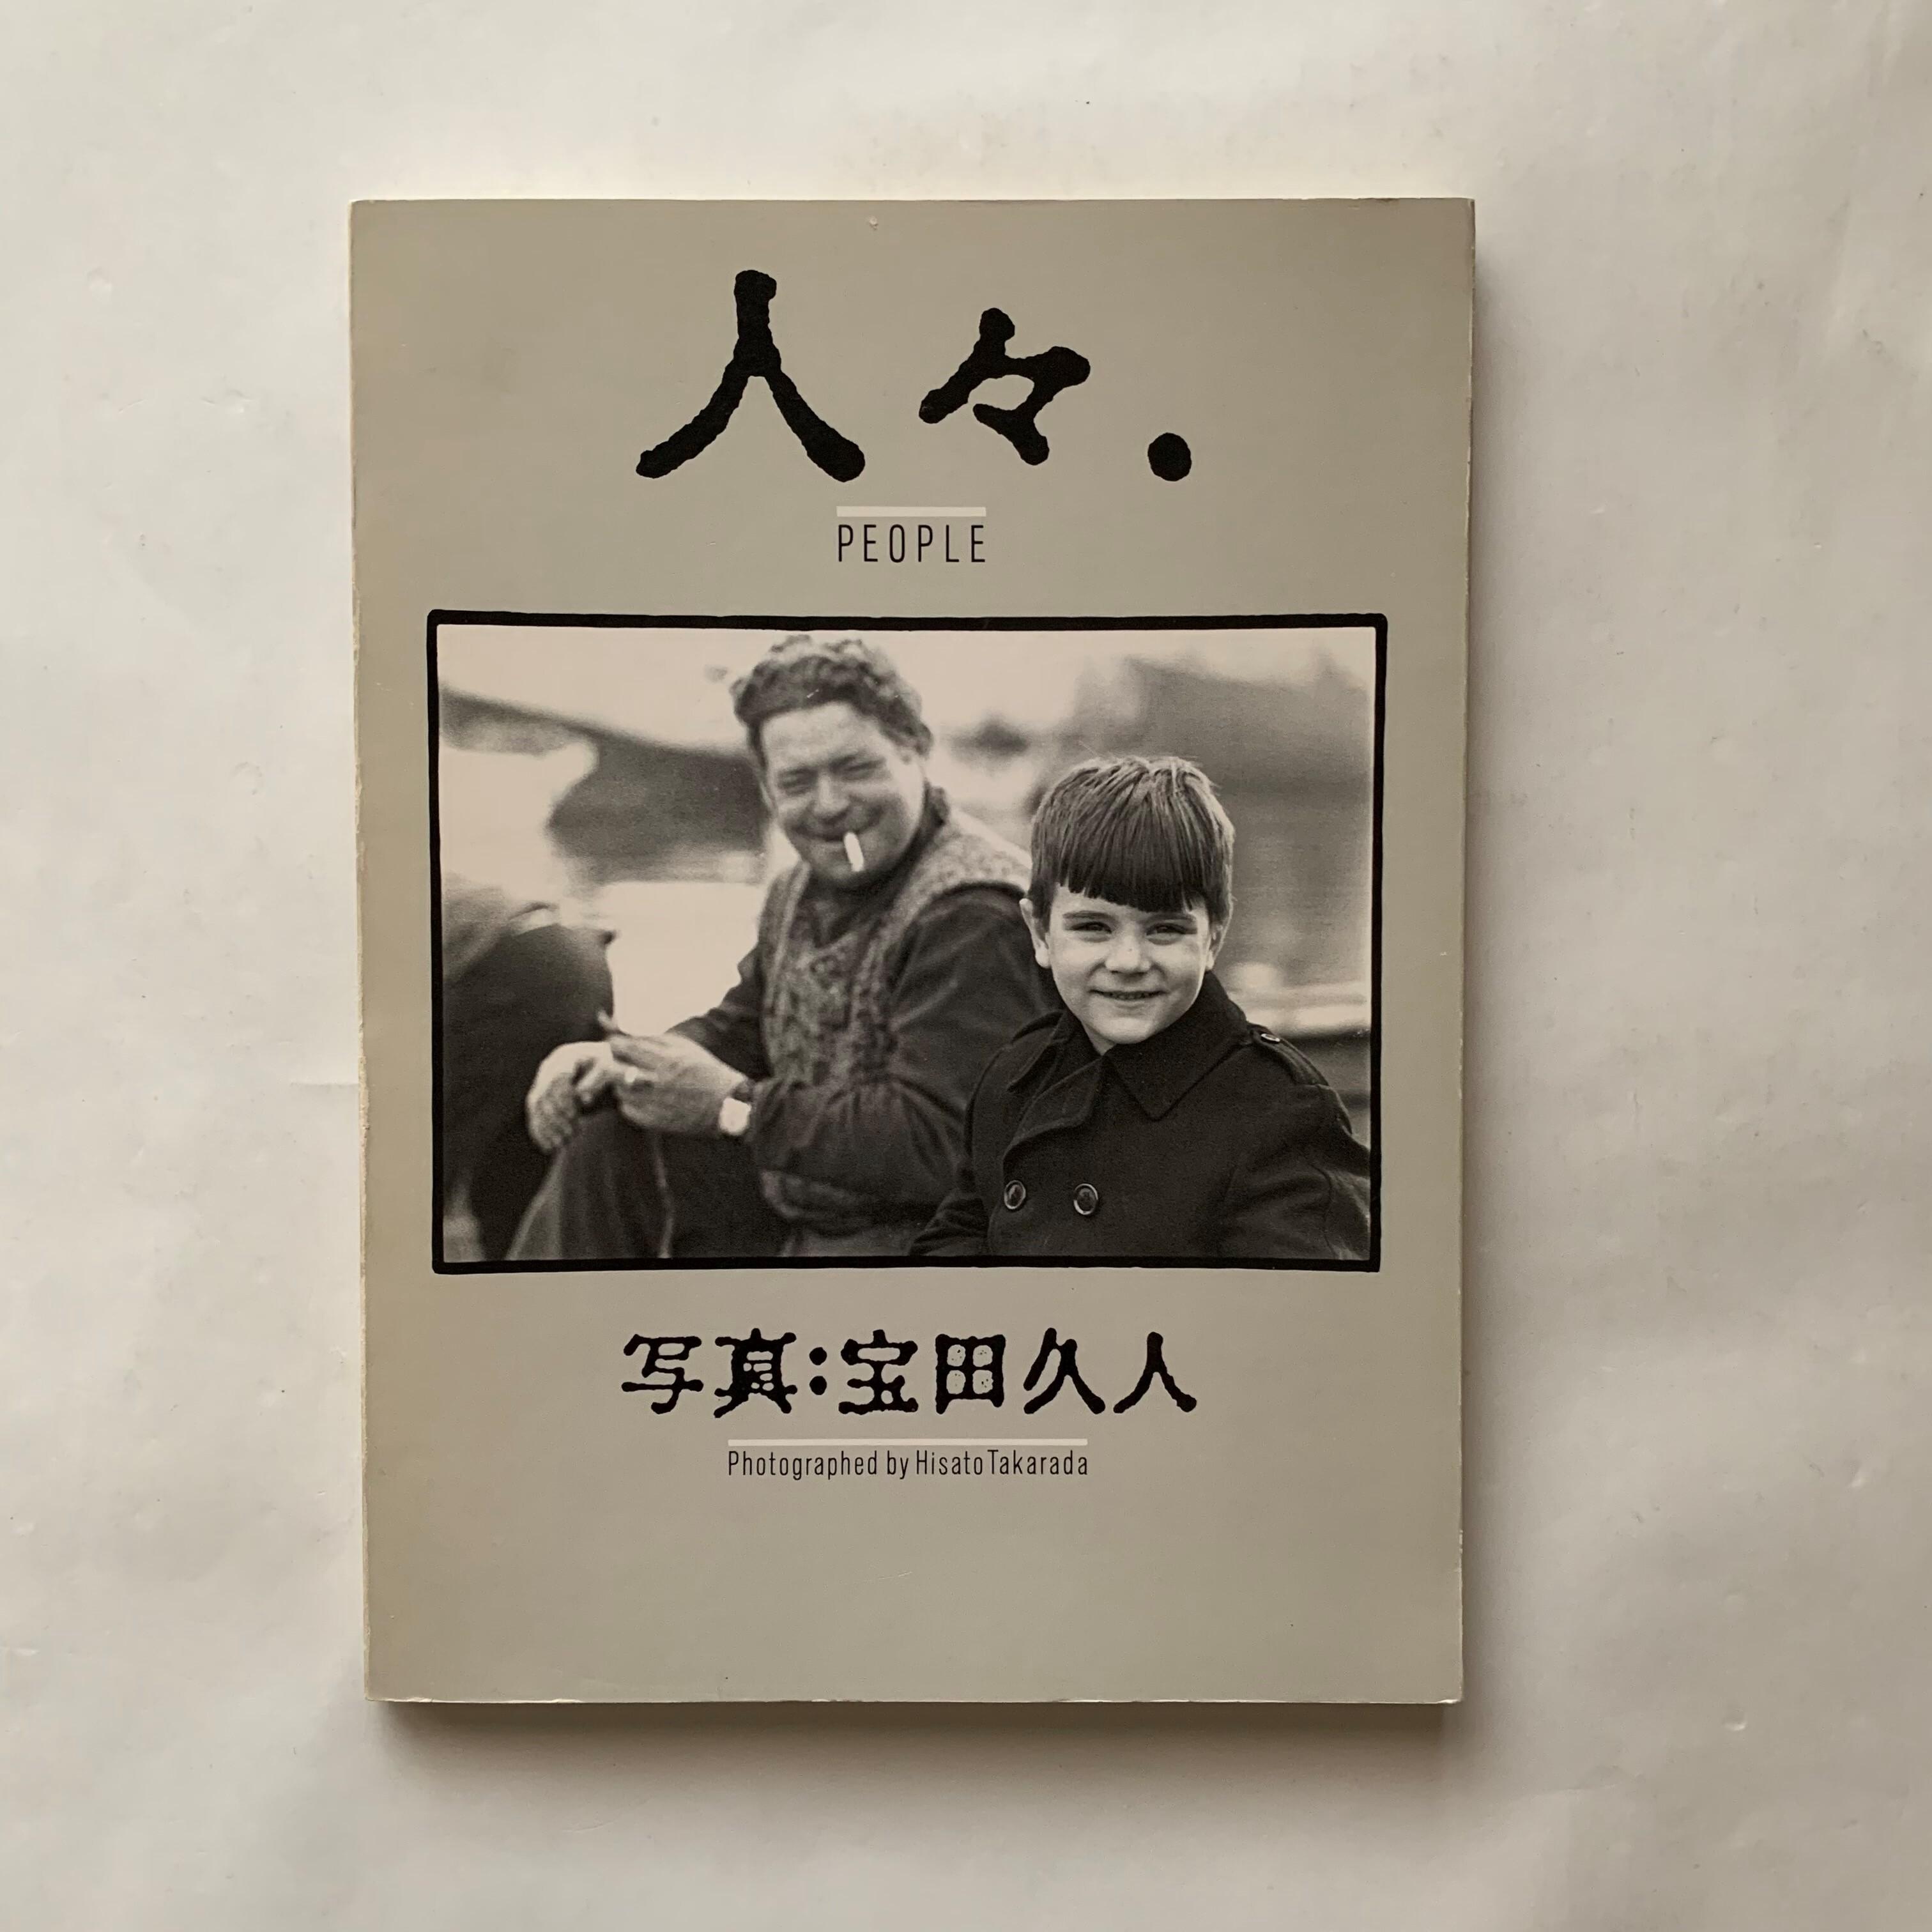 人々 PEOPLE  /  宝田久人